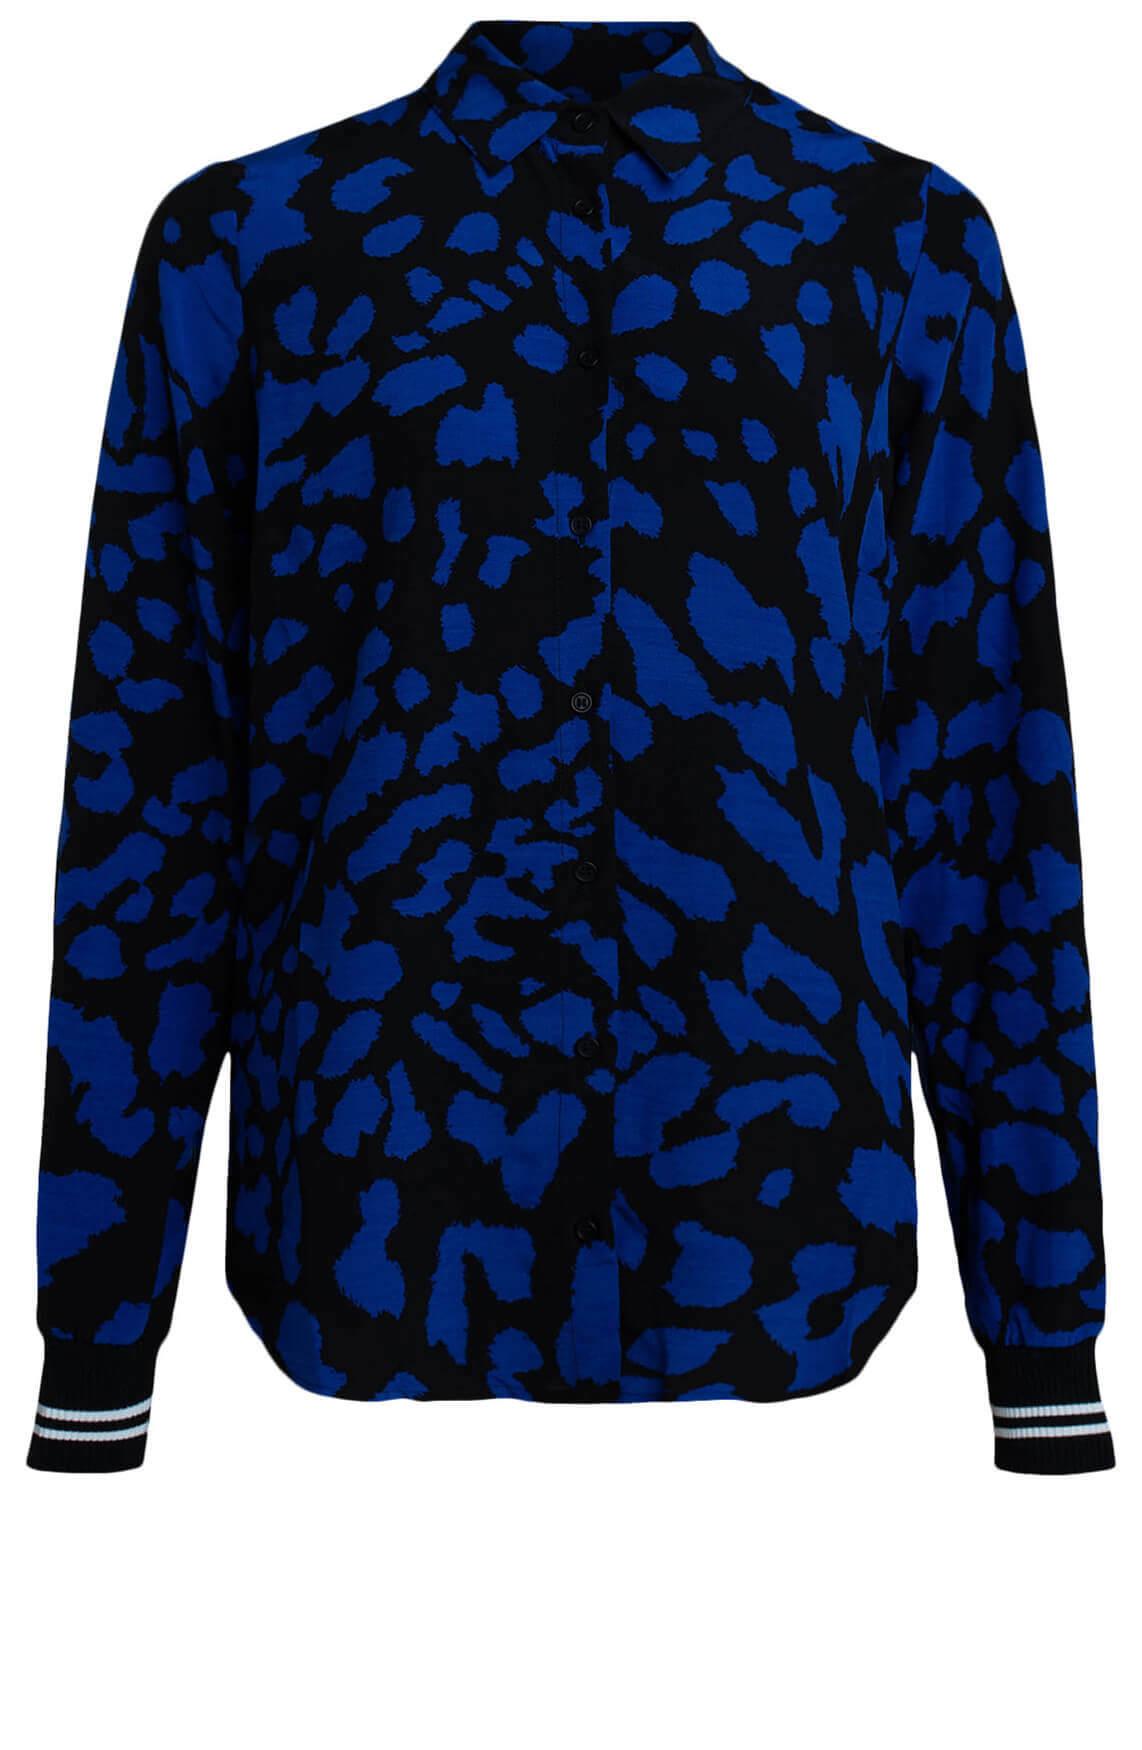 Anna Blue Dames Blouse met gevlekte print Blauw